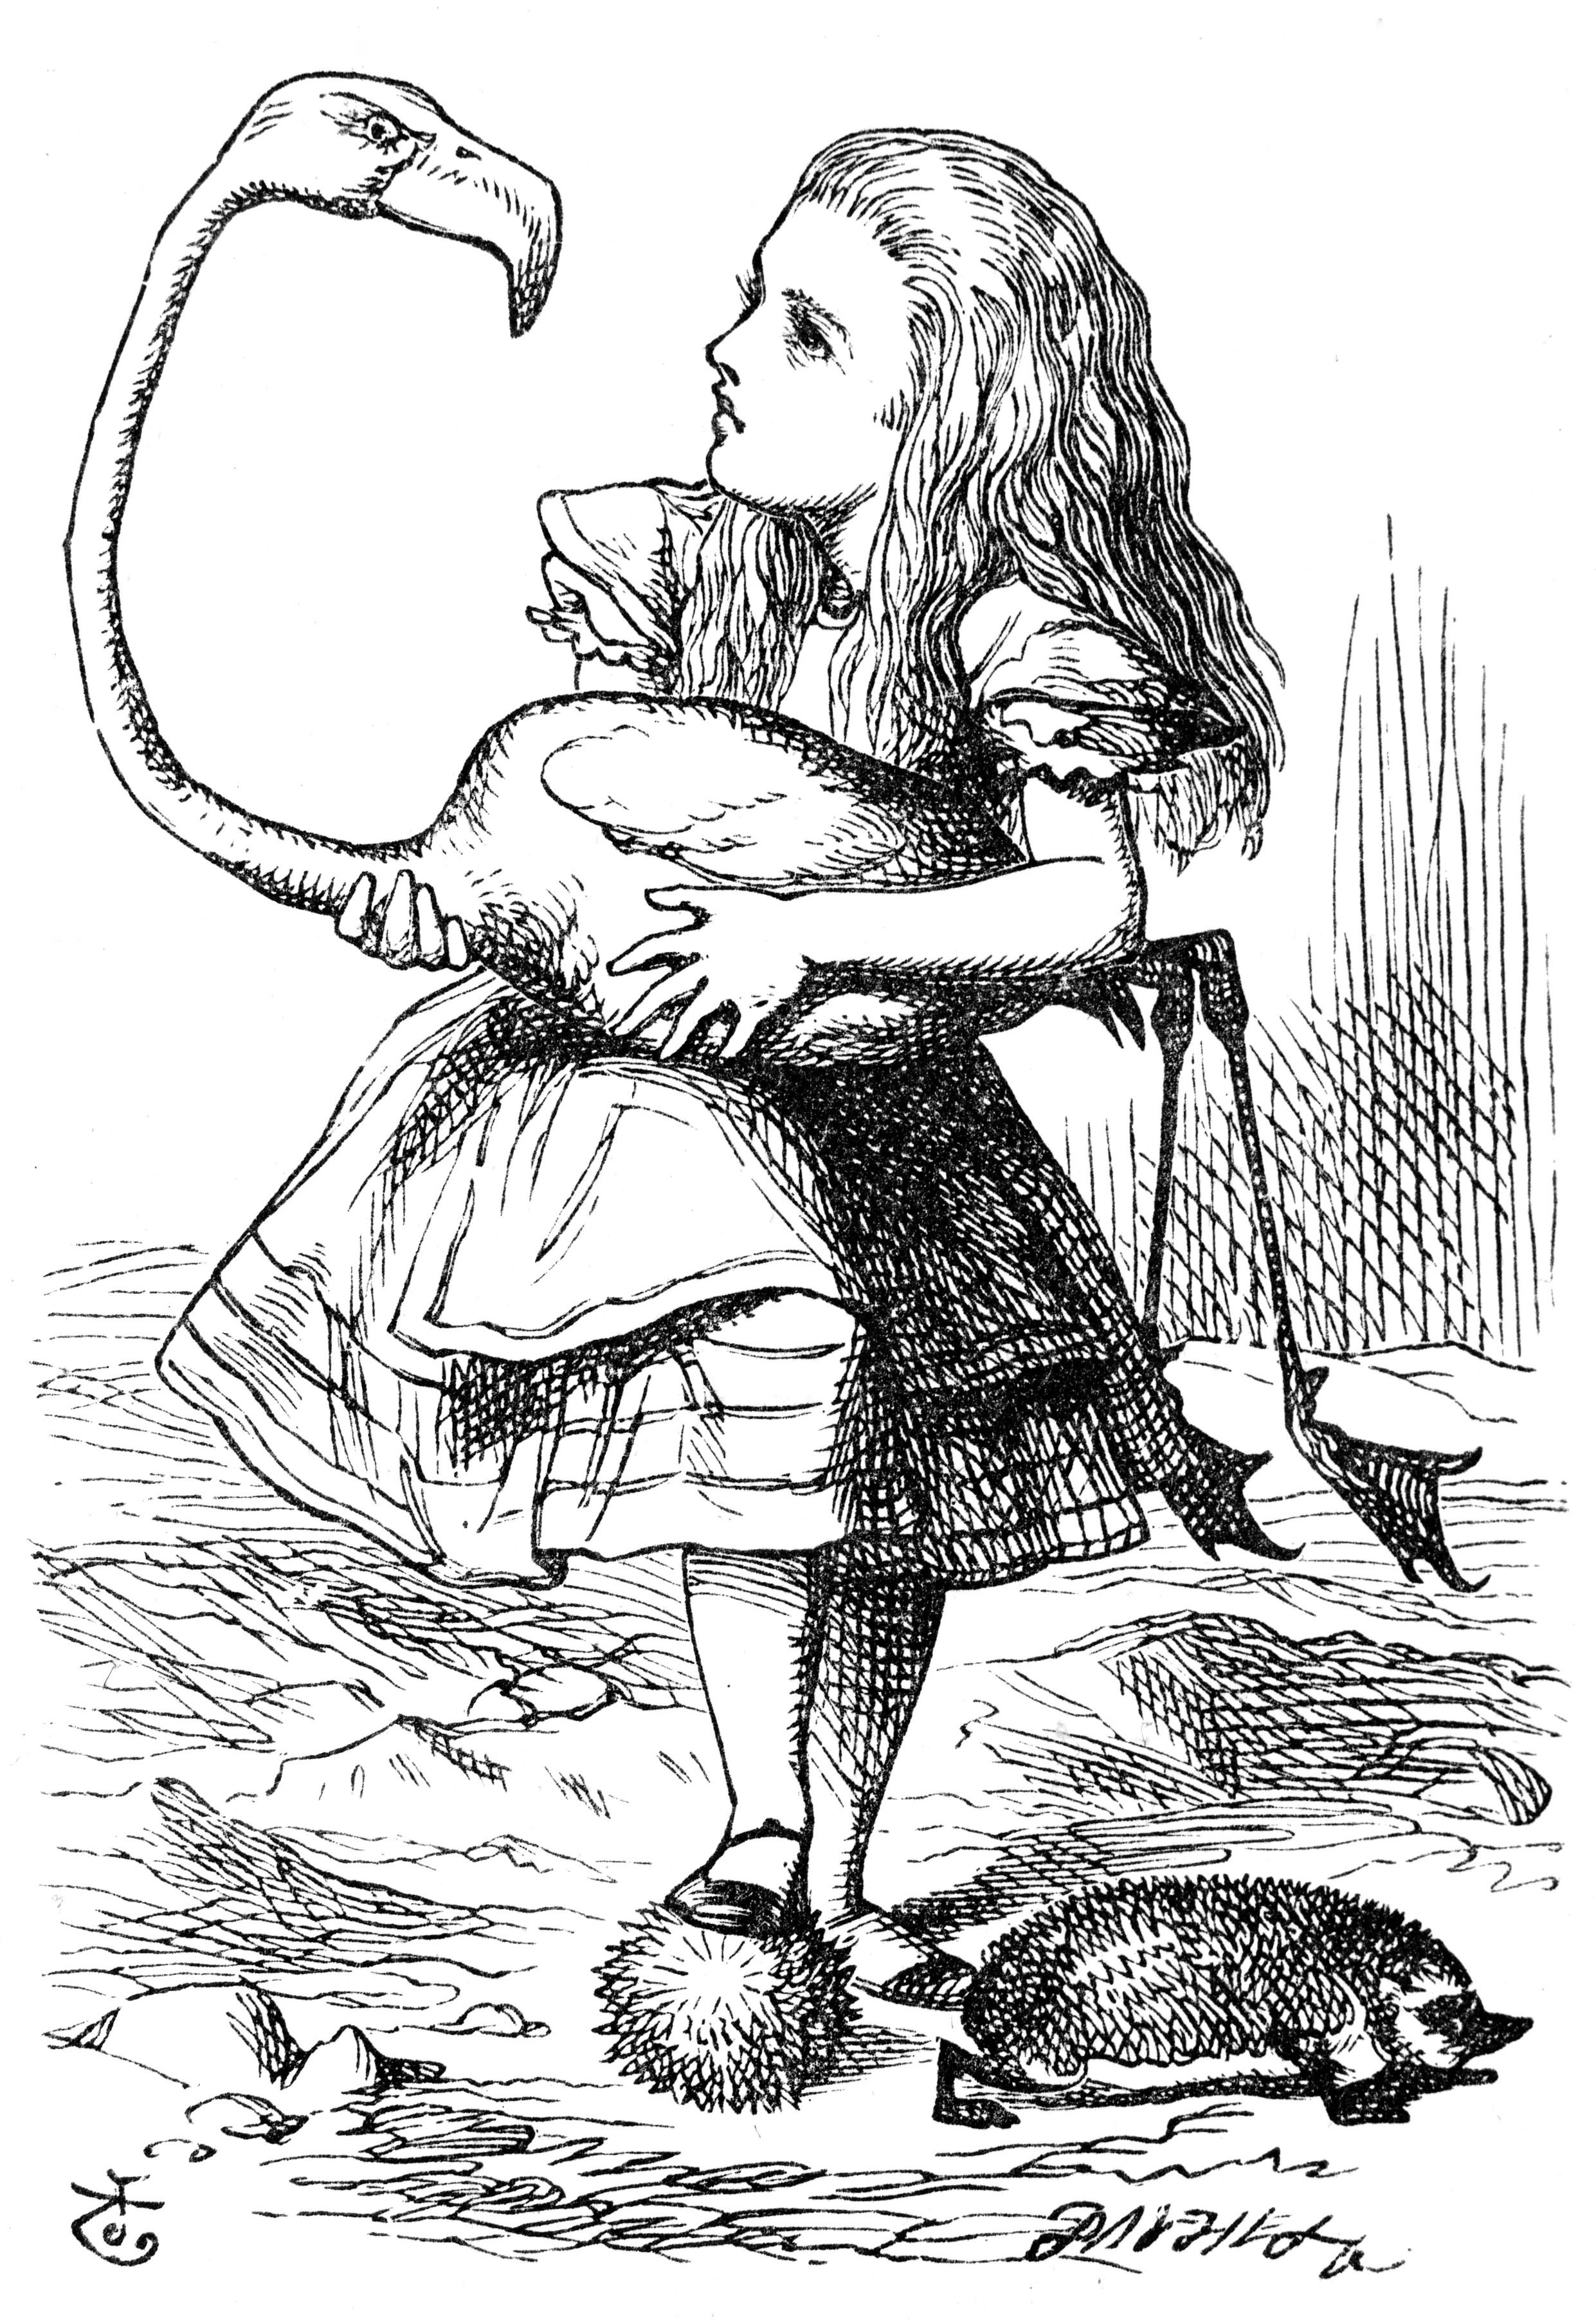 Popular Women's Names: Alice